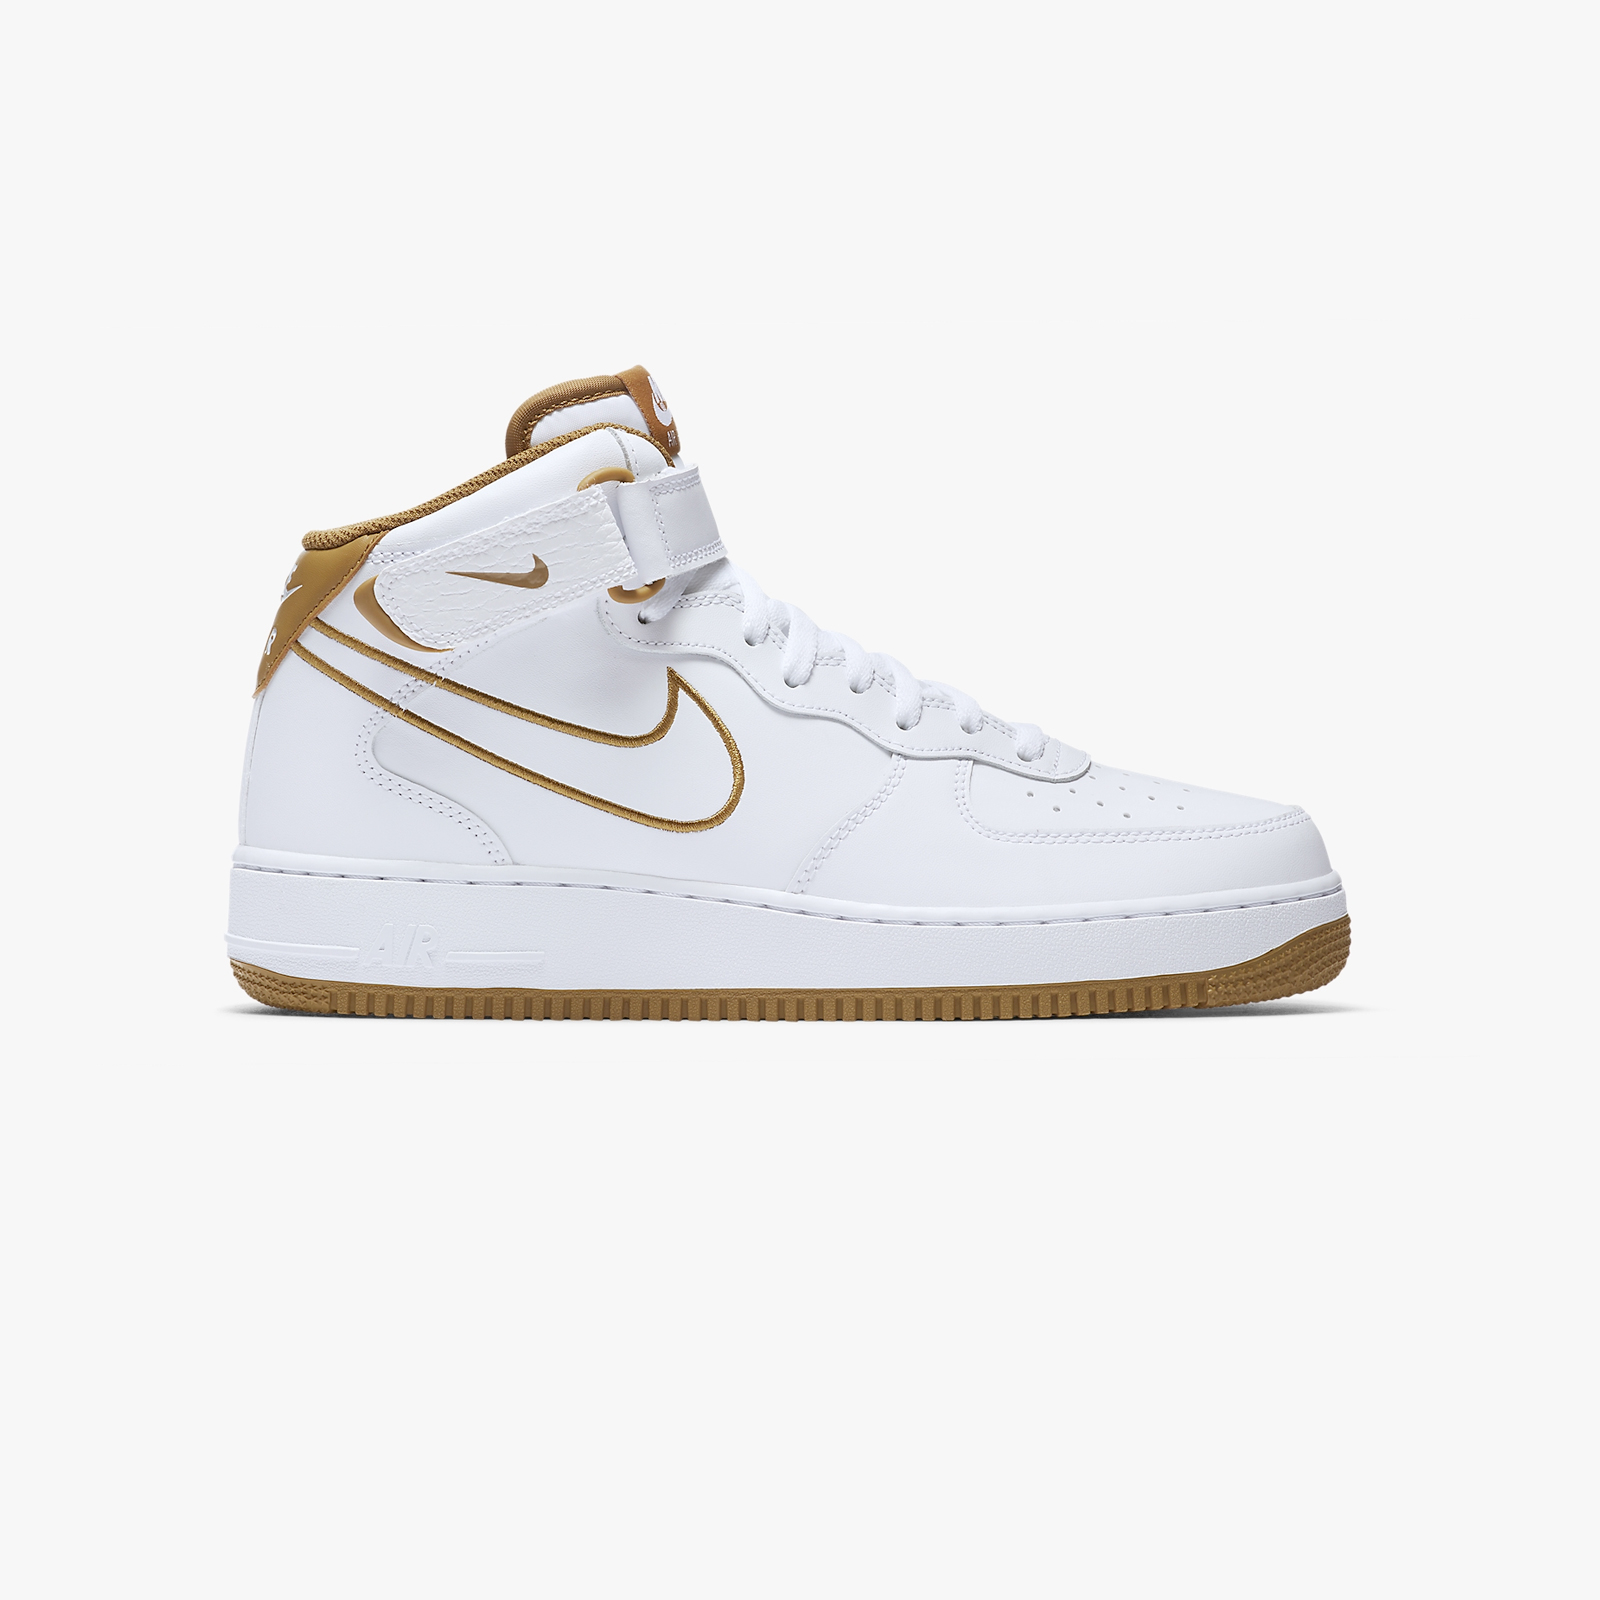 73ea728e90fa2 Nike Air Force 1 Mid 07 - Aq8650-101 - Sneakersnstuff